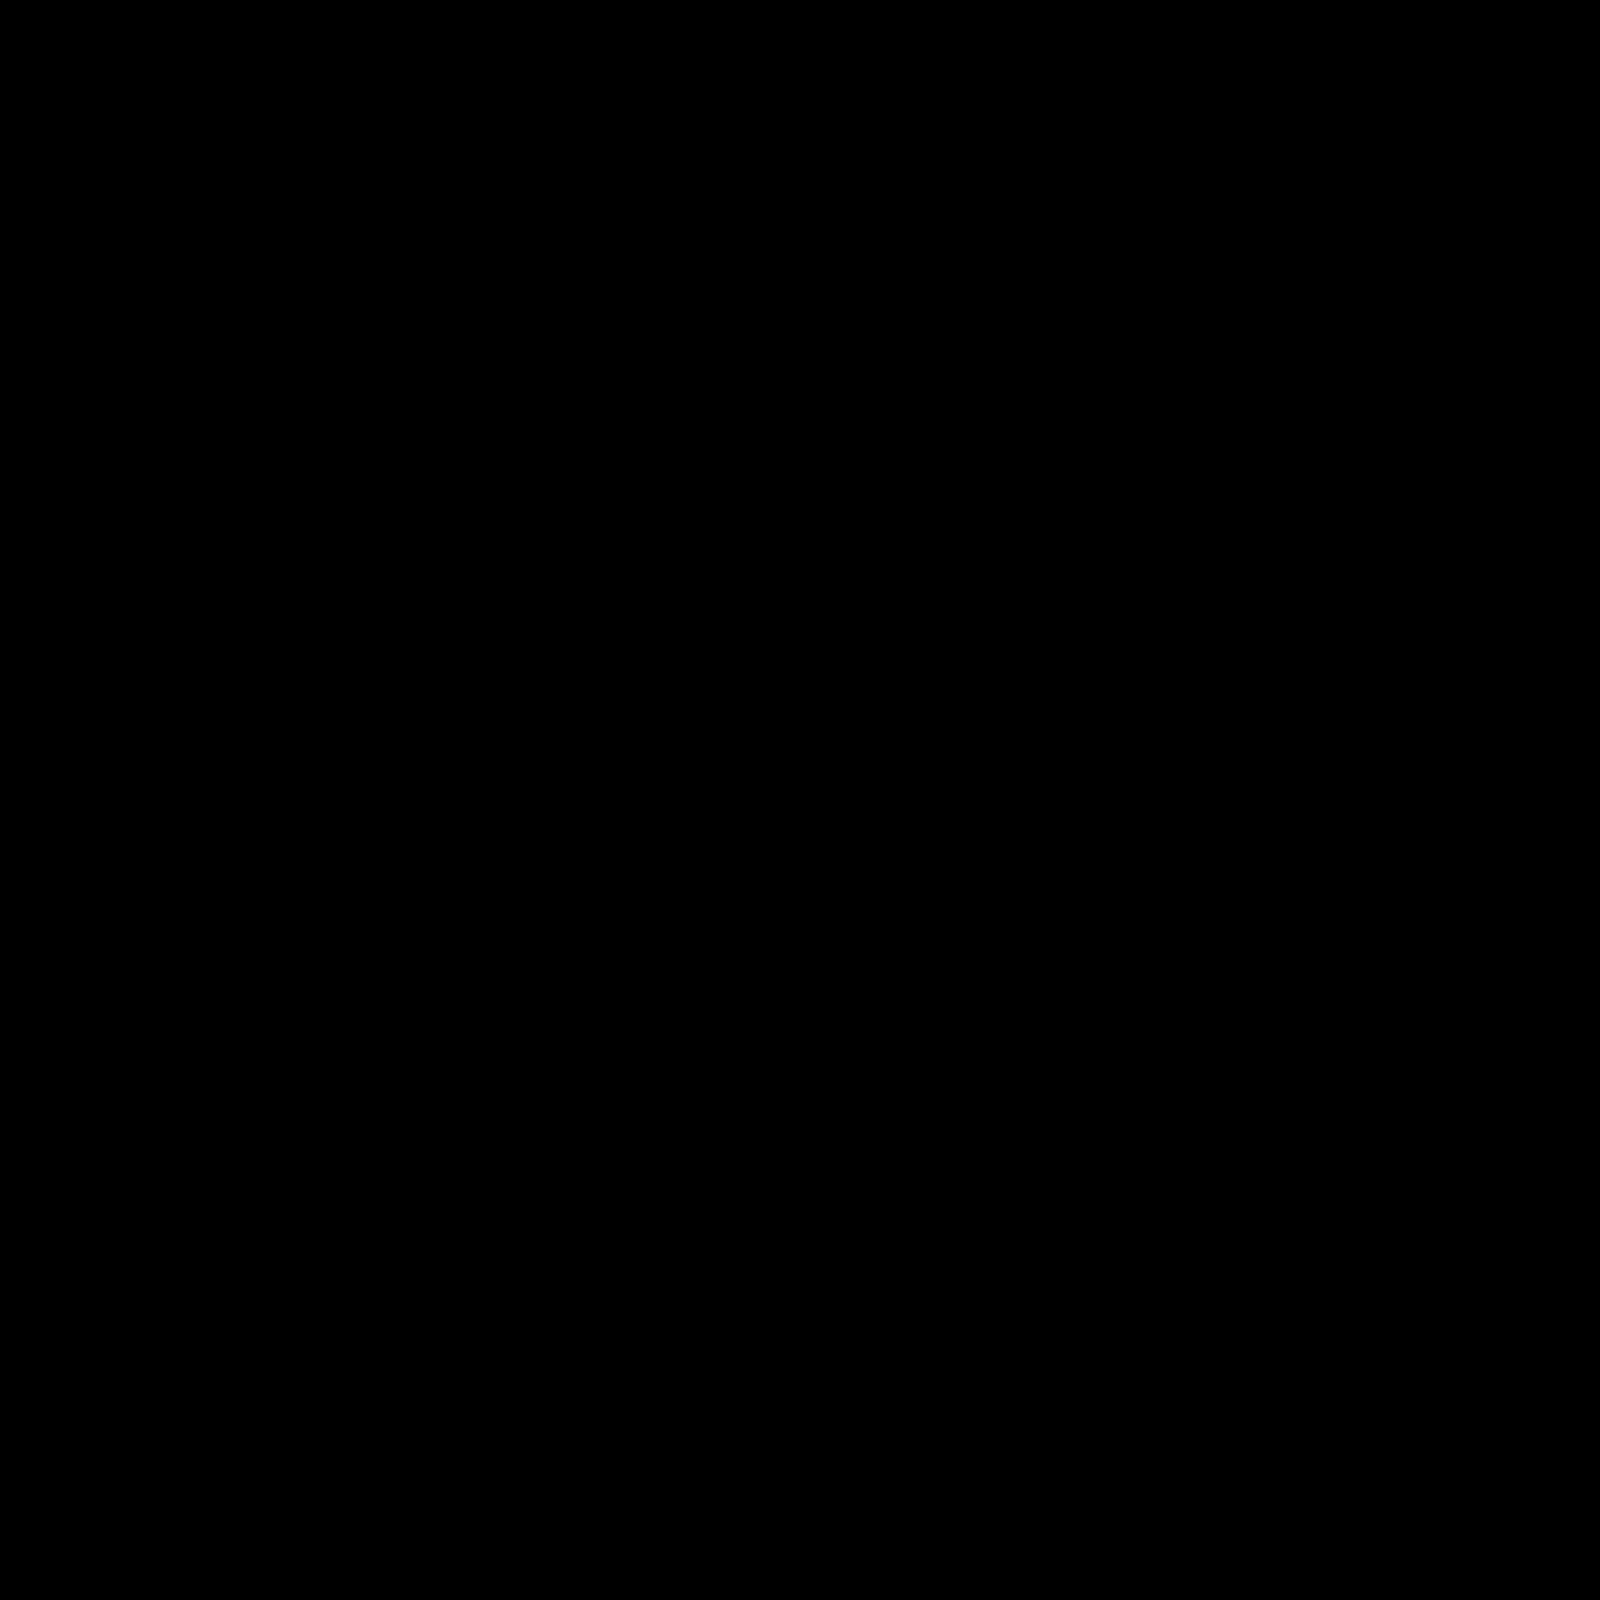 Cloud Lightning icon